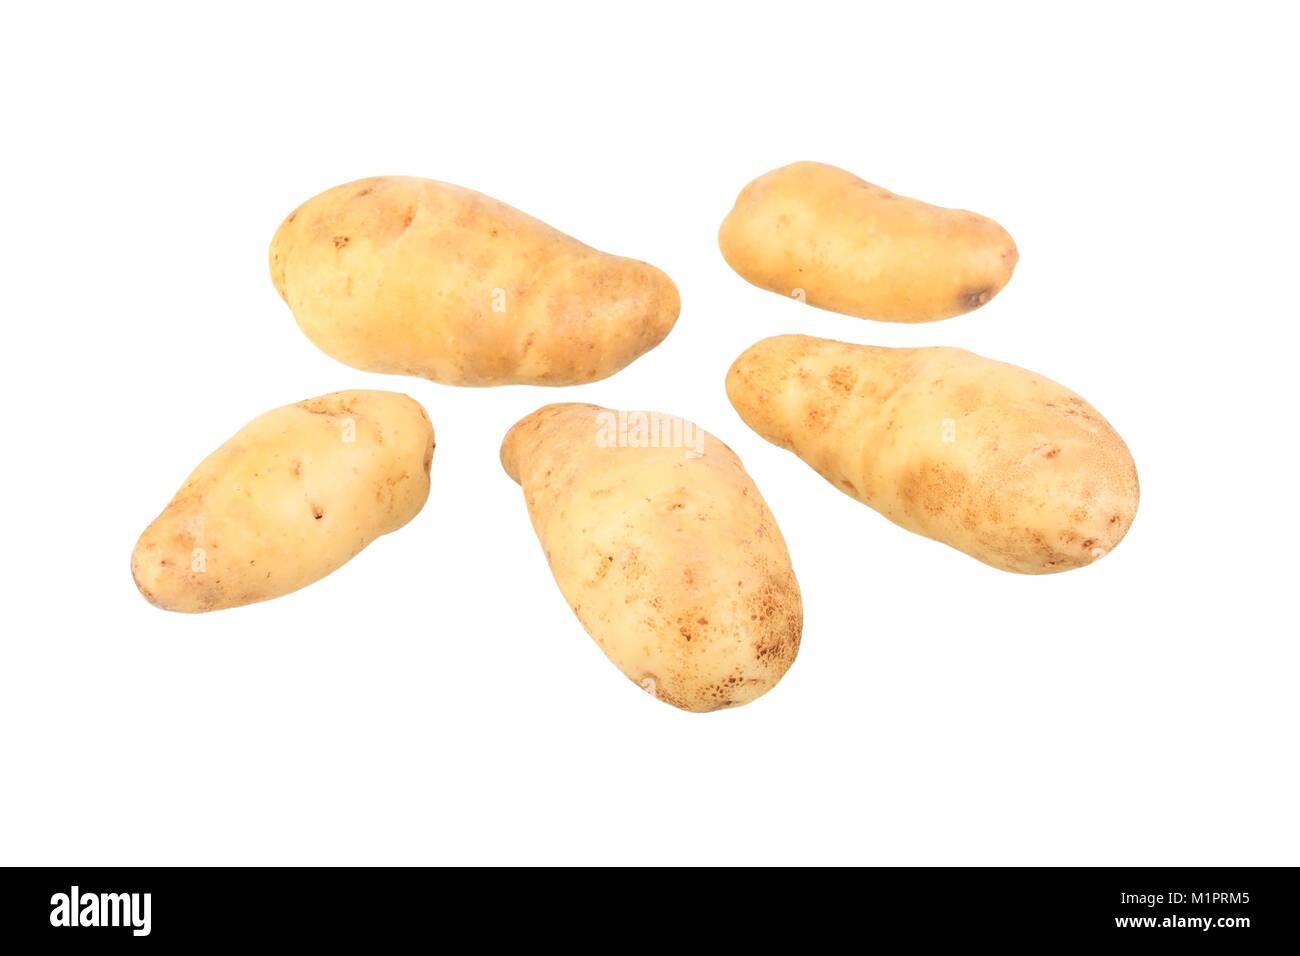 Potato Variety de la rat Ardeche, free plates, Kartoffelsorte La Ratte de Ardeche, Freisteller Stock Photo